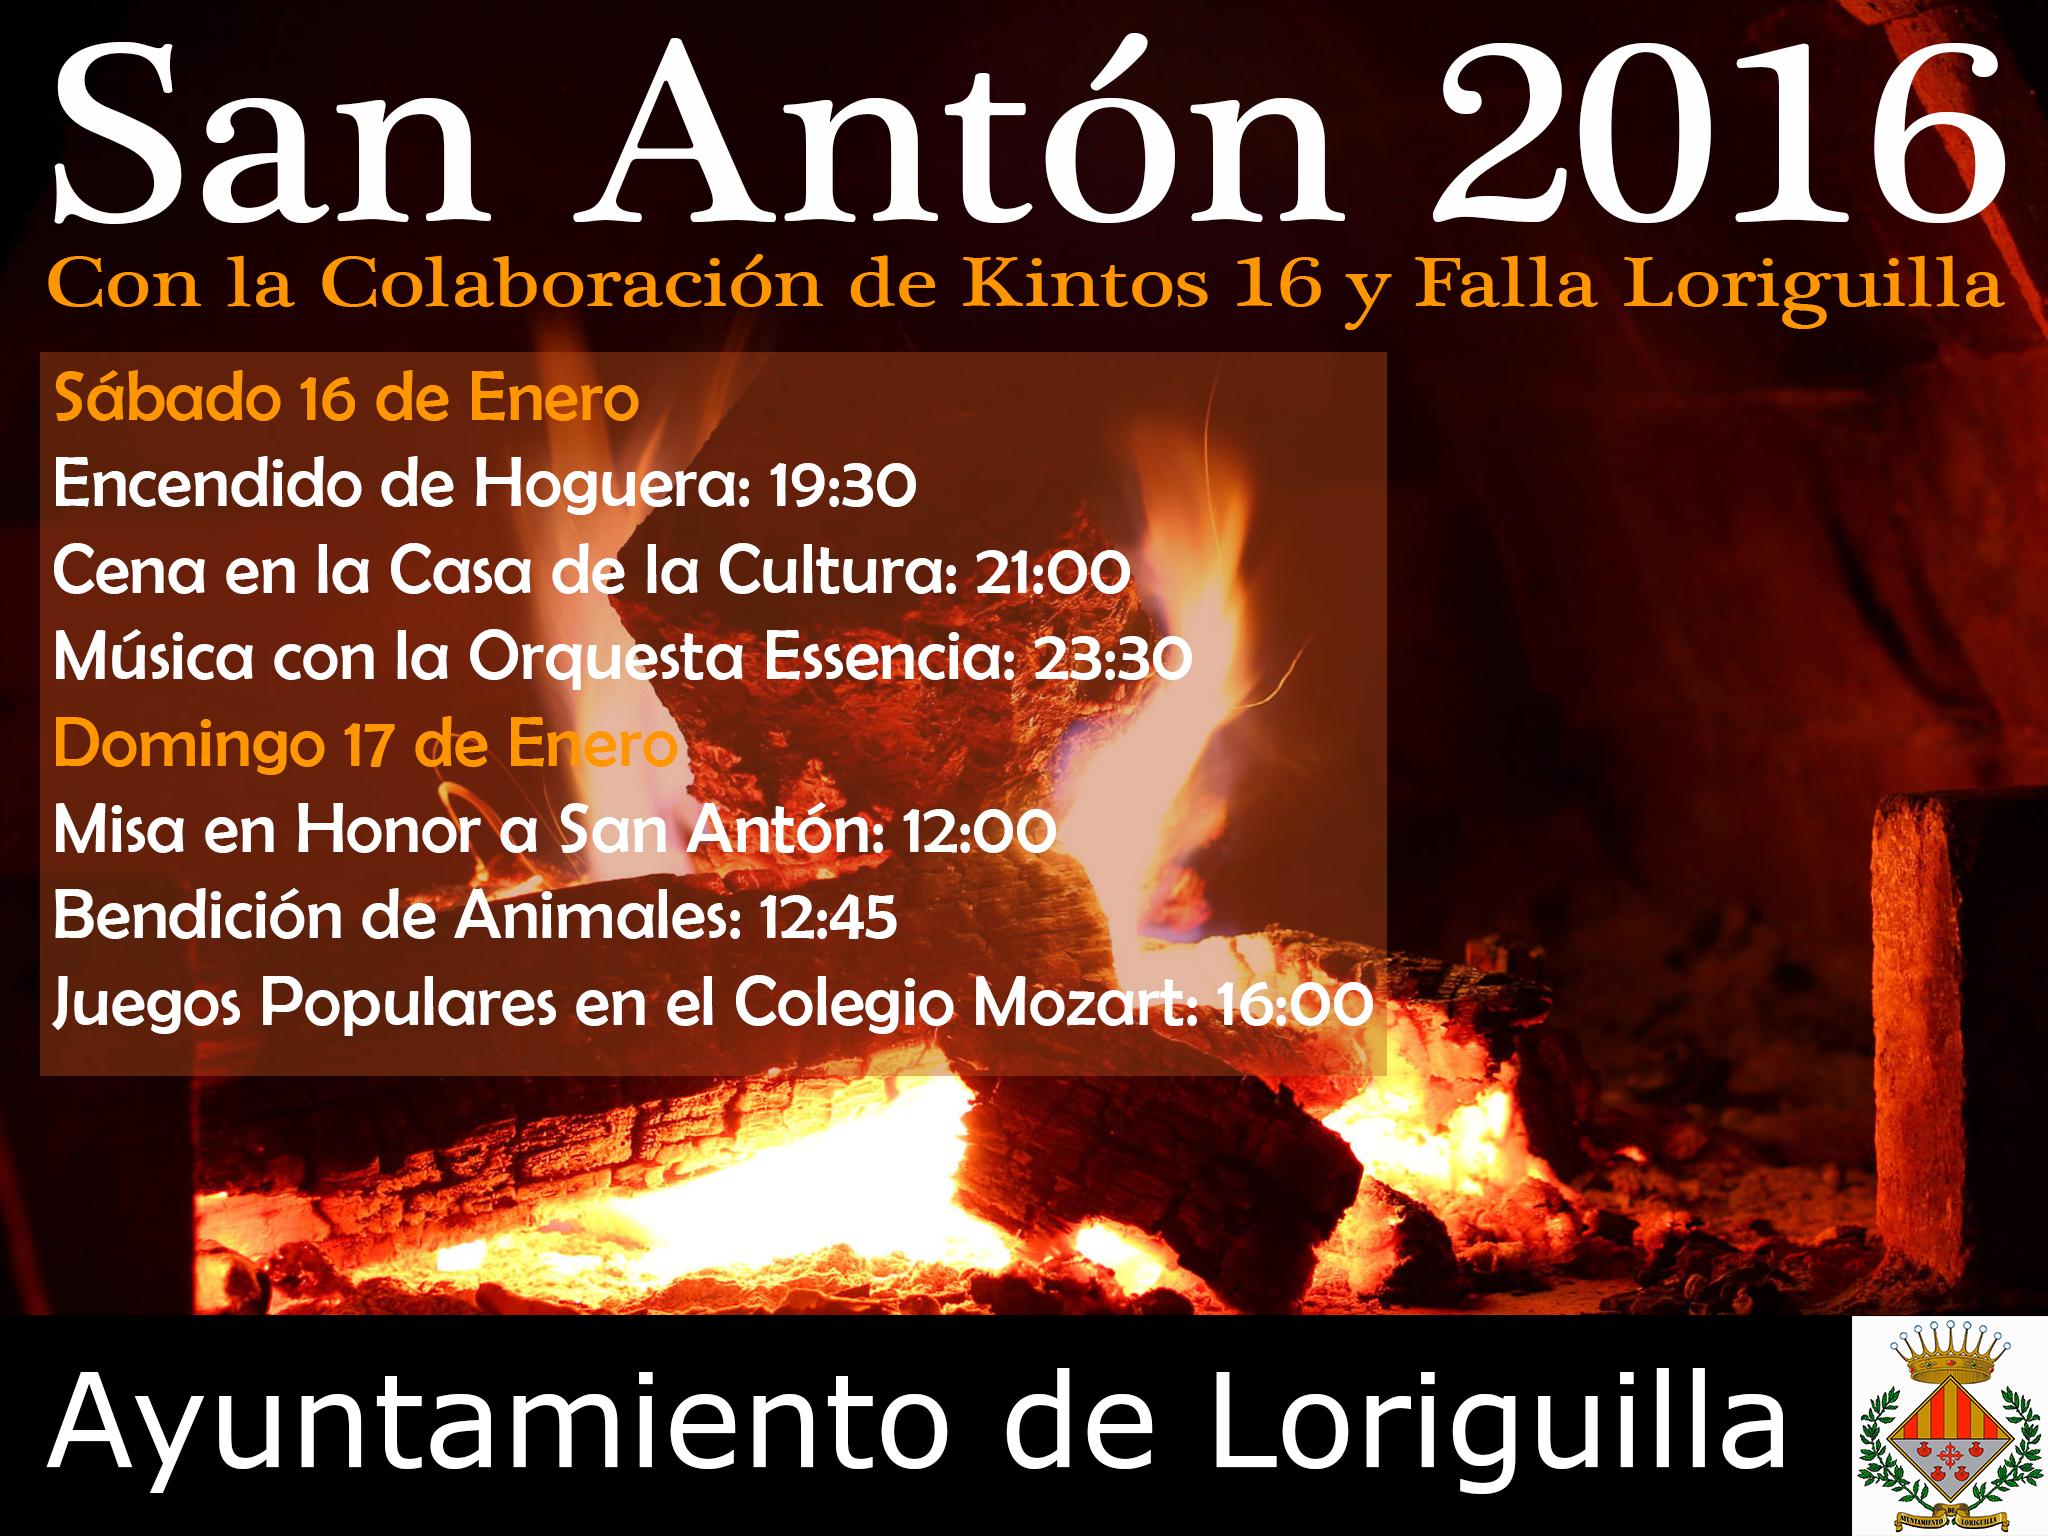 San Anton 2016